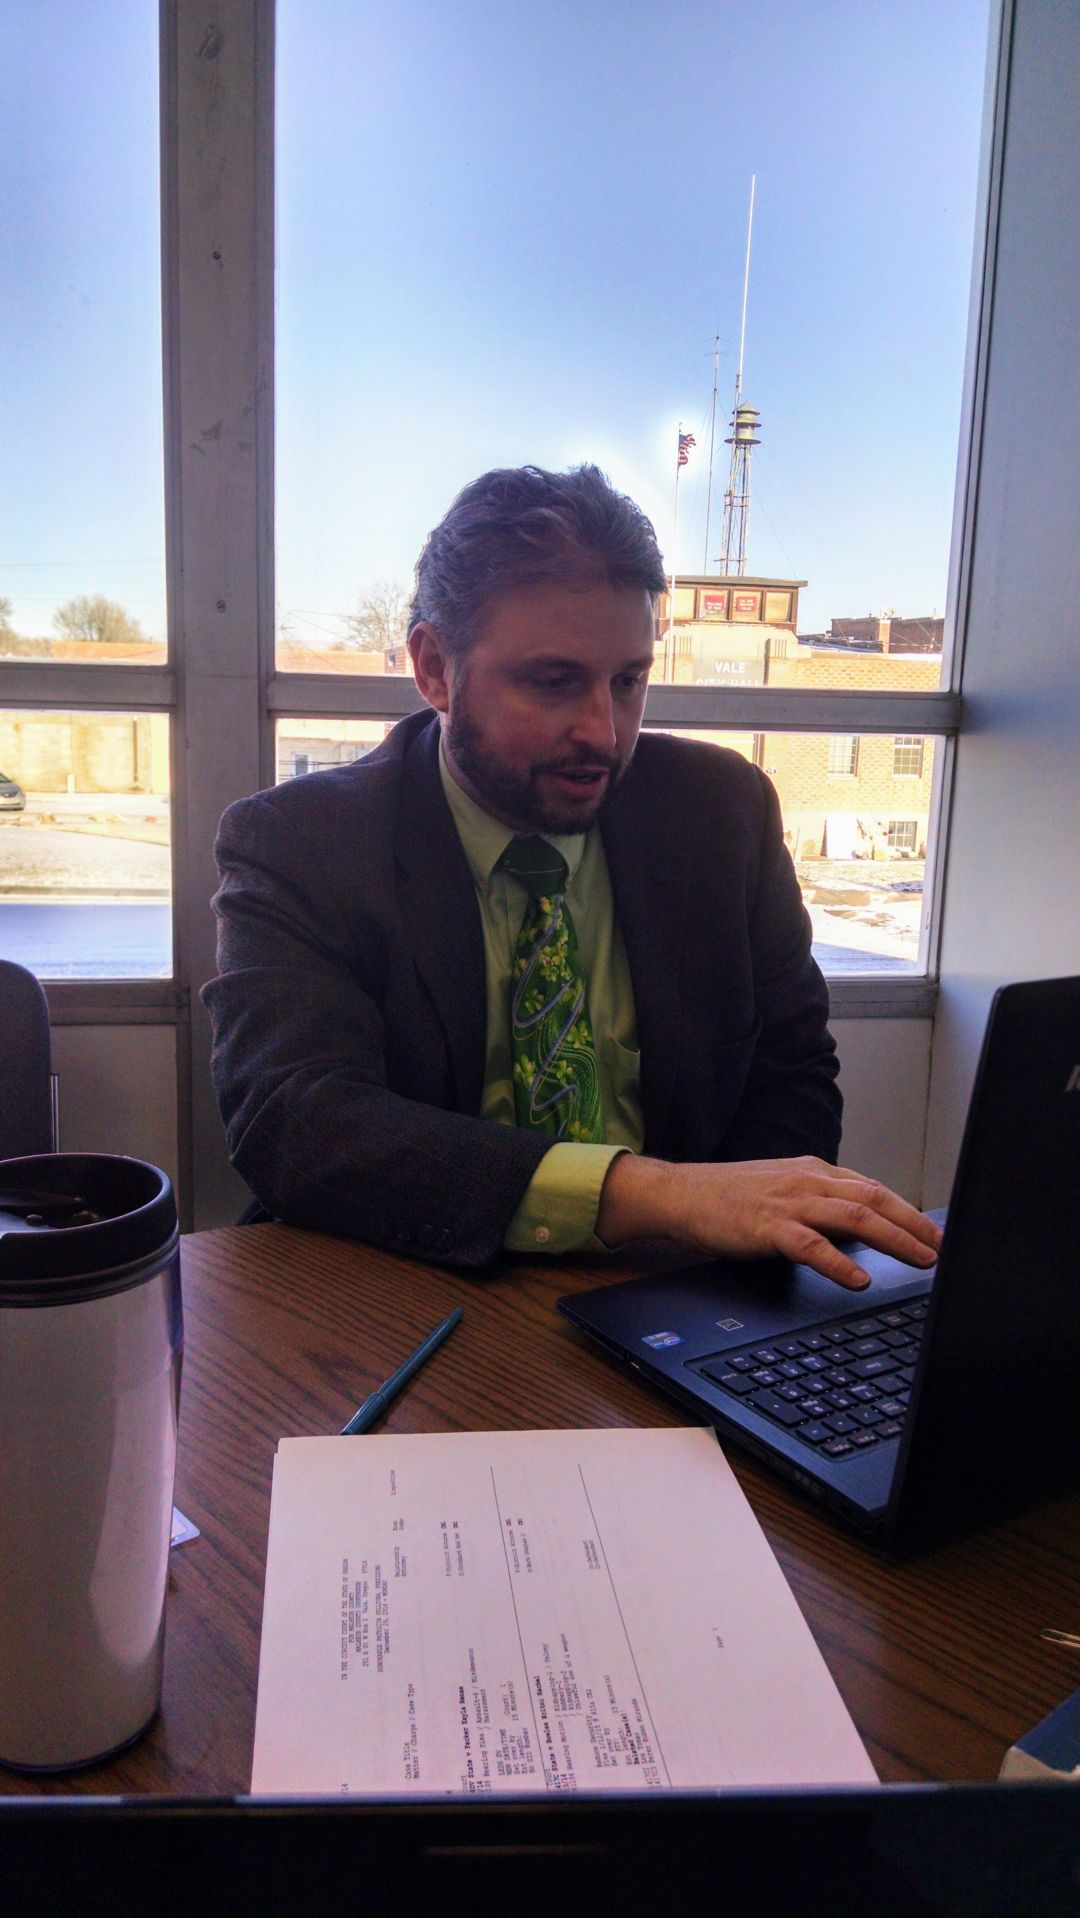 Martin faces challenger in DA race